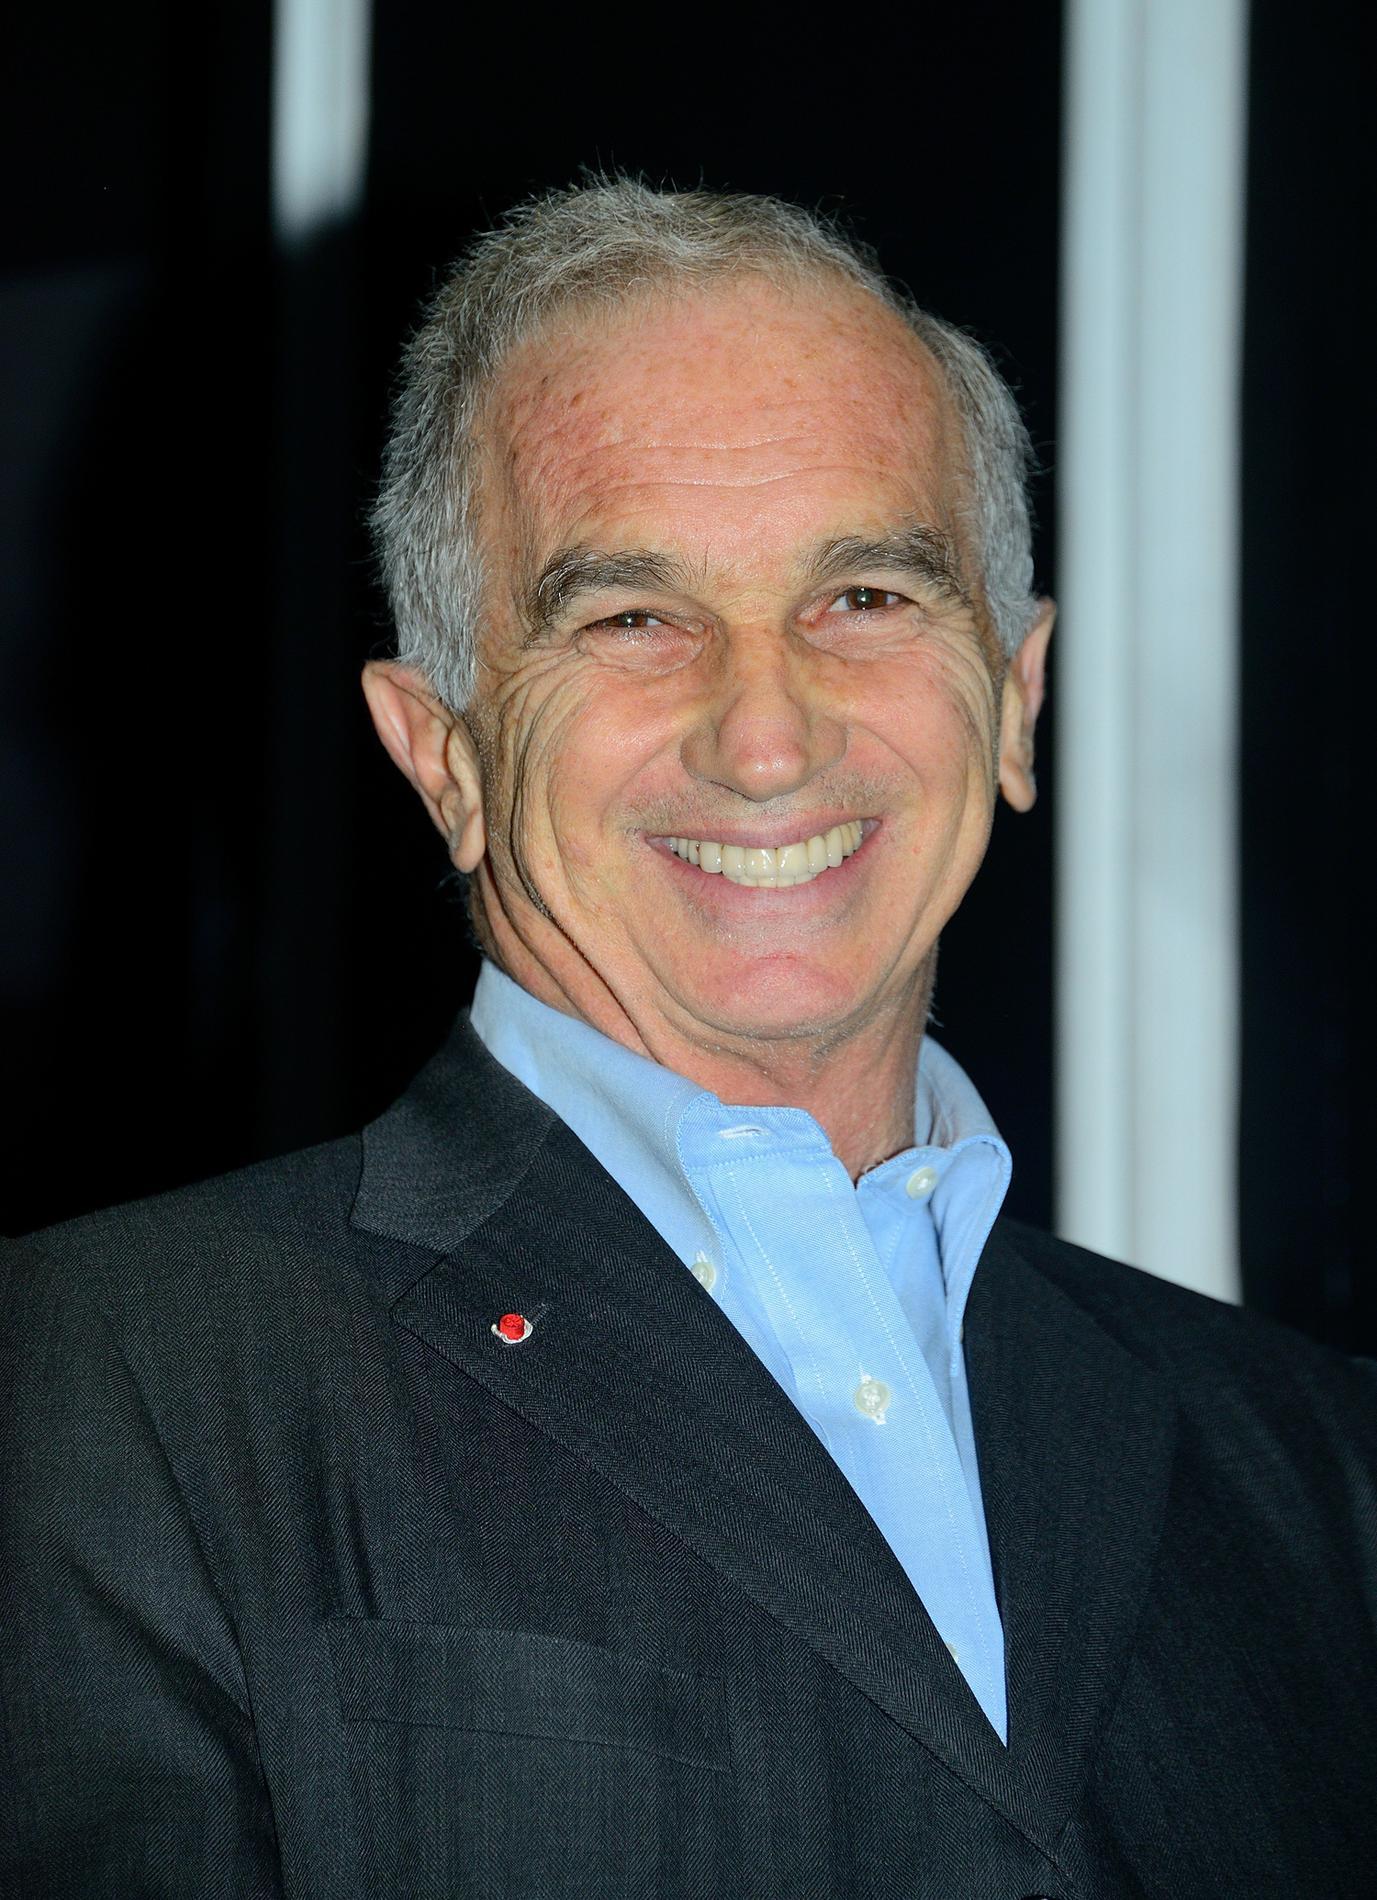 Alain Terzian net worth